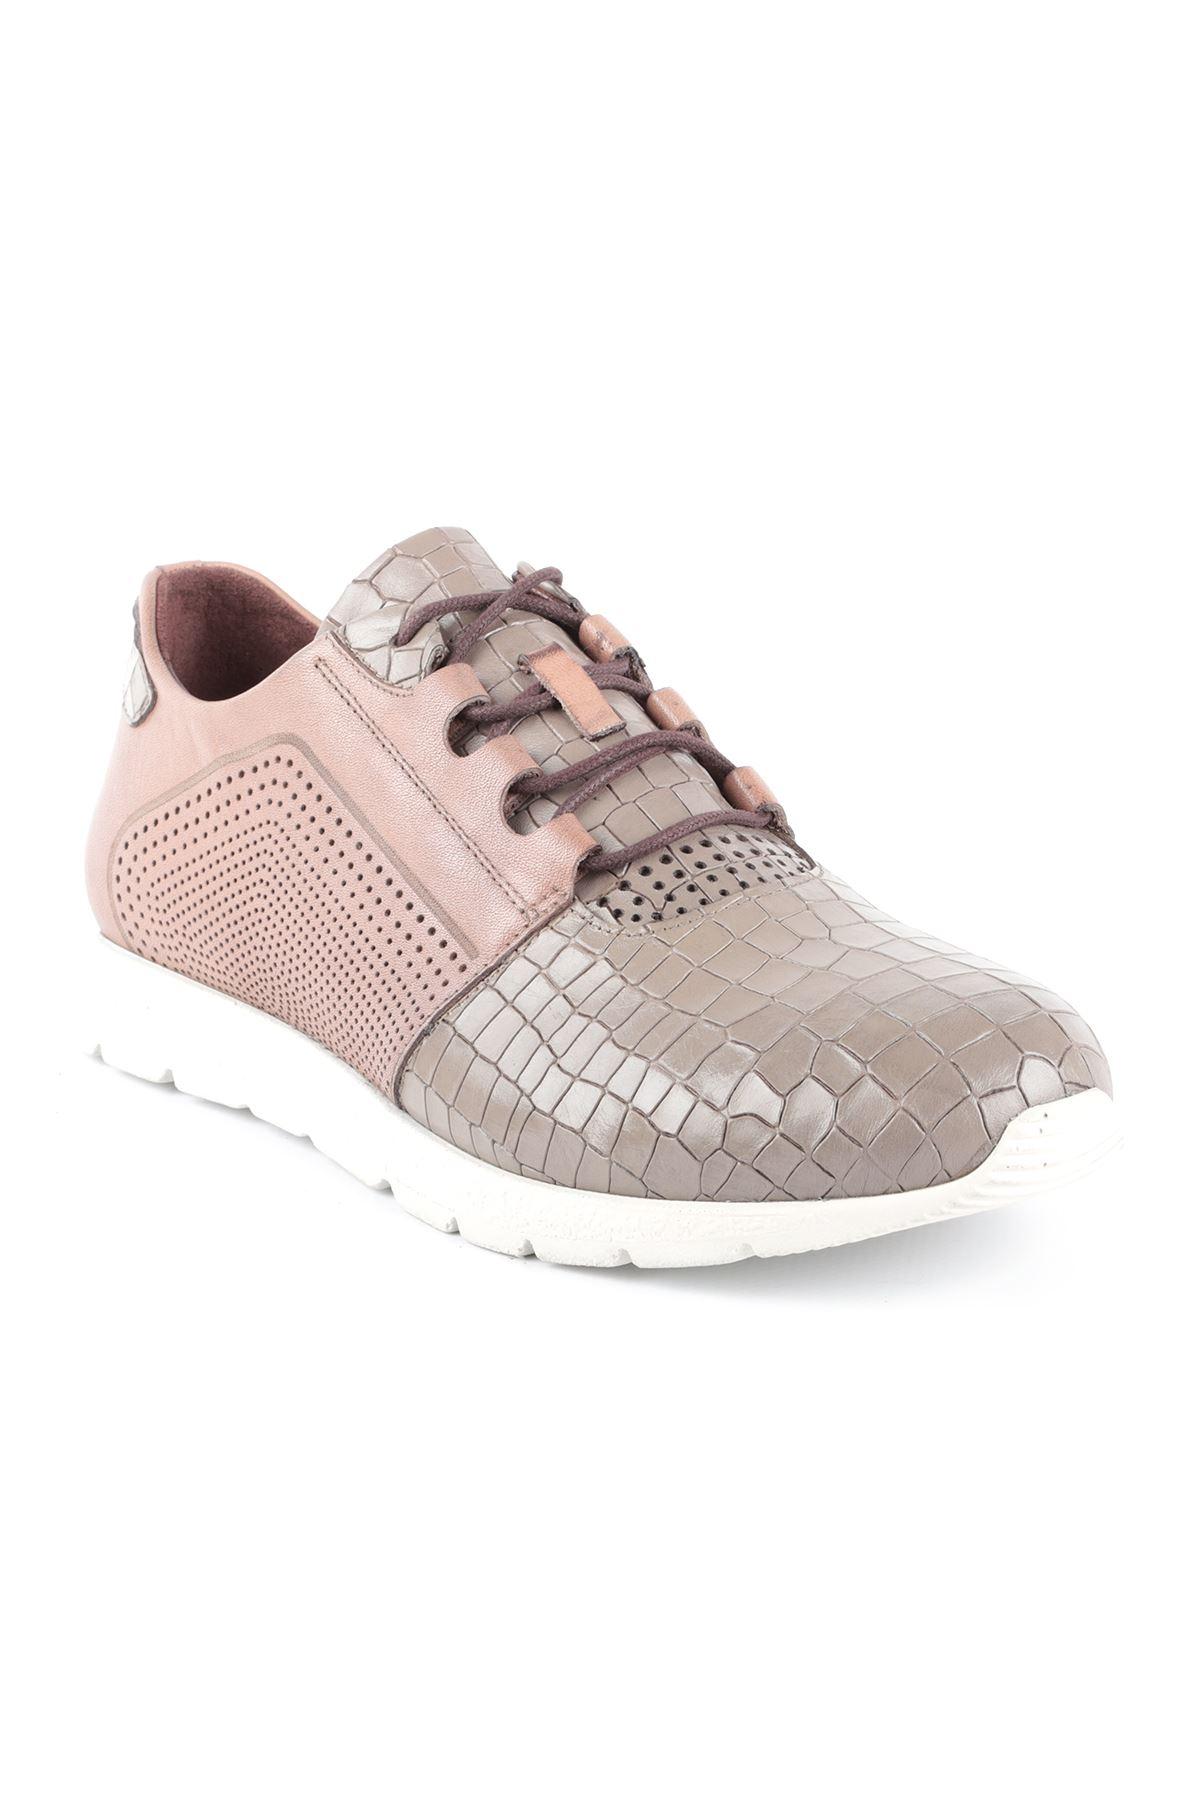 Libero T1433 Mink Sport Shoes